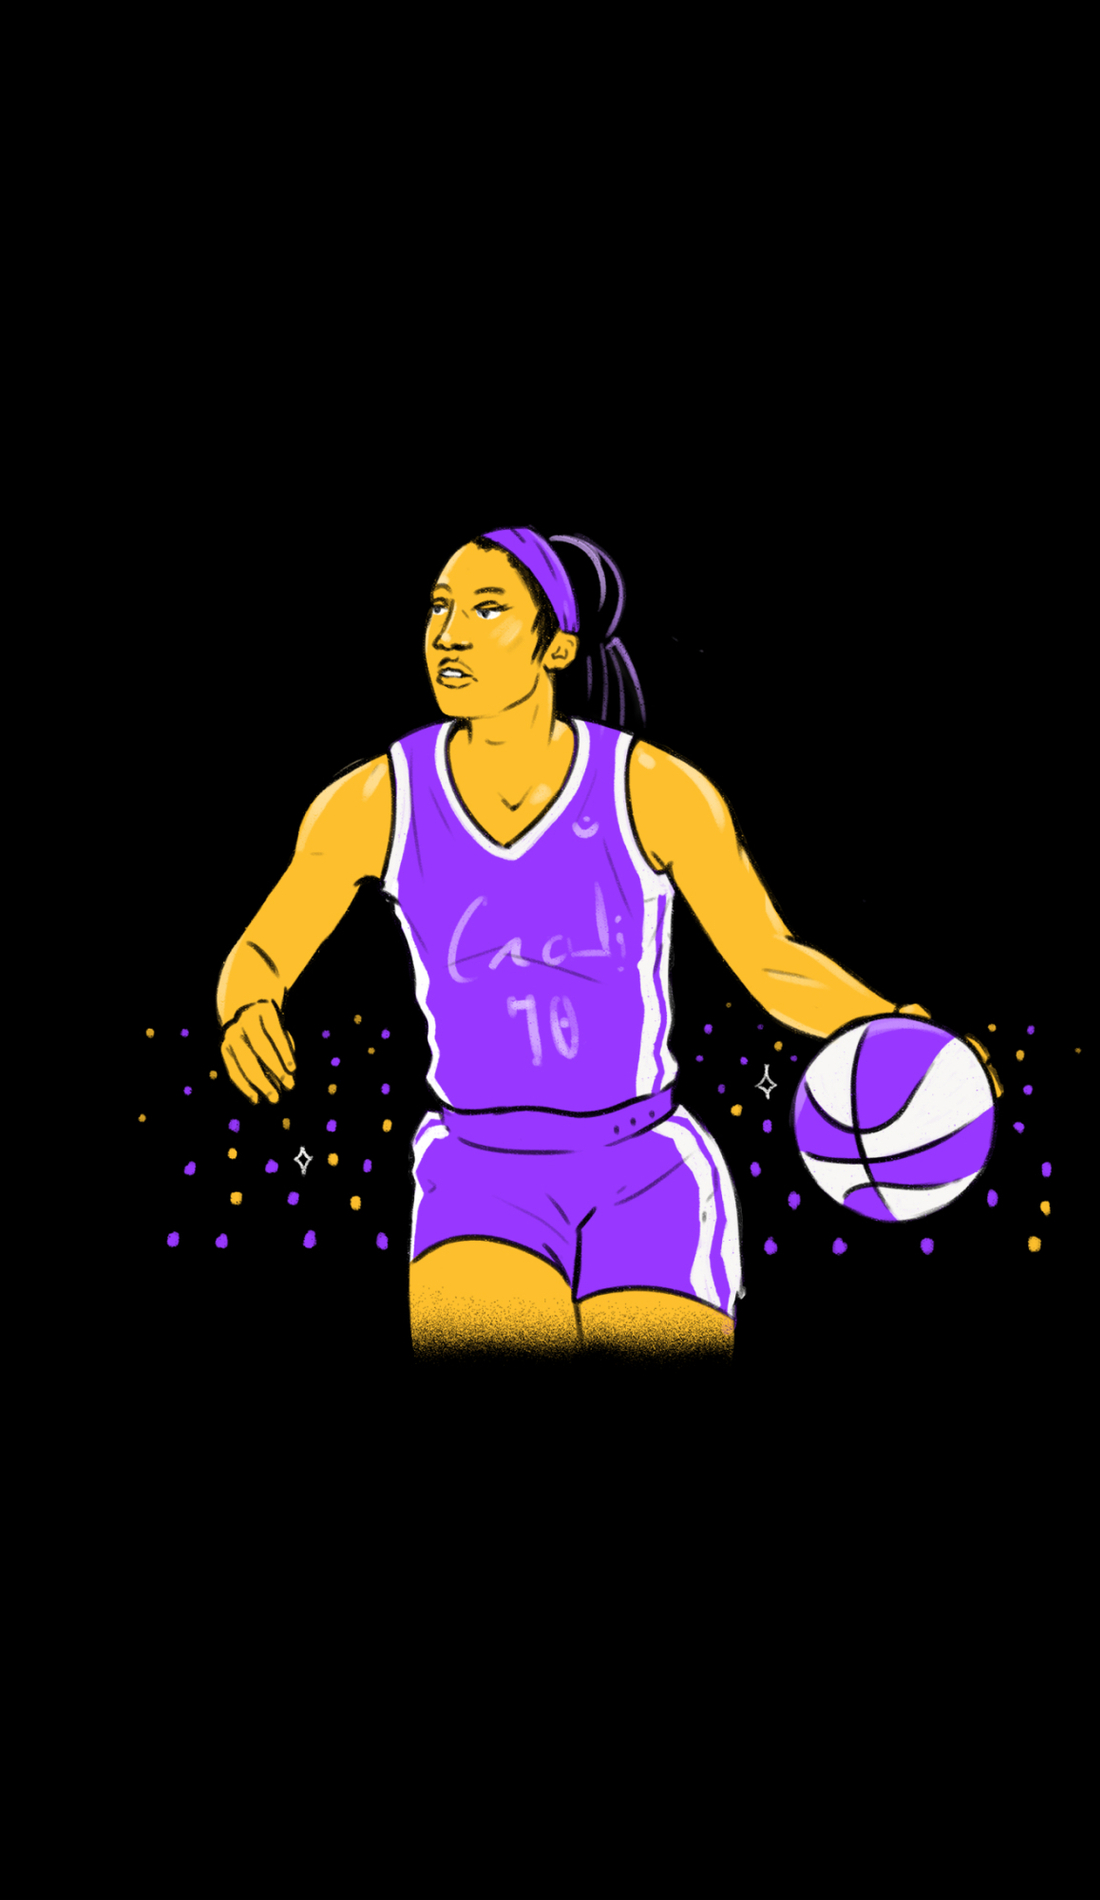 A Gonzaga Bulldogs Womens Basketball live event